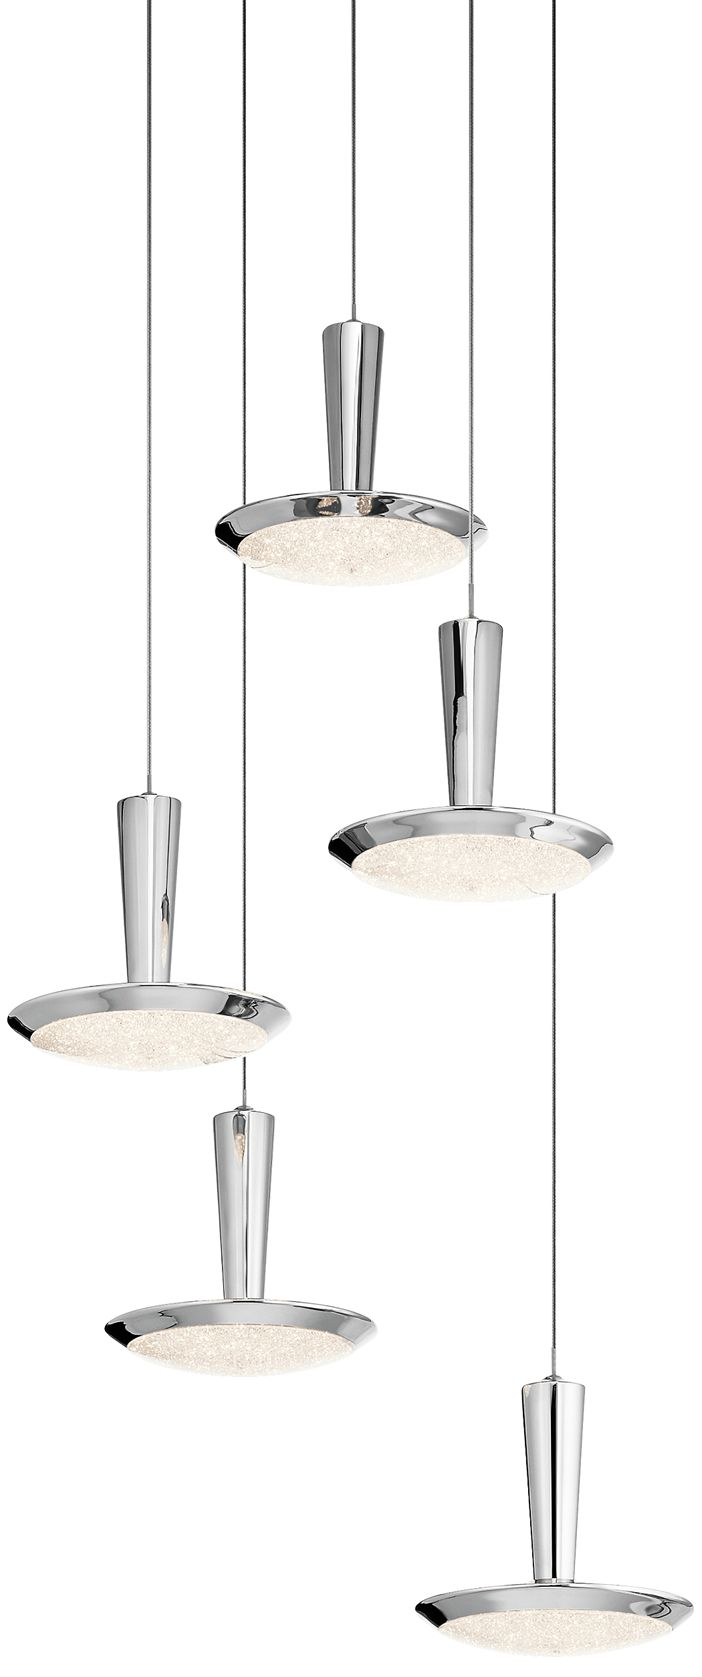 Elan Karah 17 3/4  Wide Nickel 5-LED Multi-Light Pendant  sc 1 st  L&s Plus & Multi Light Pendant Lighting Fixtures | Lamps Plus azcodes.com